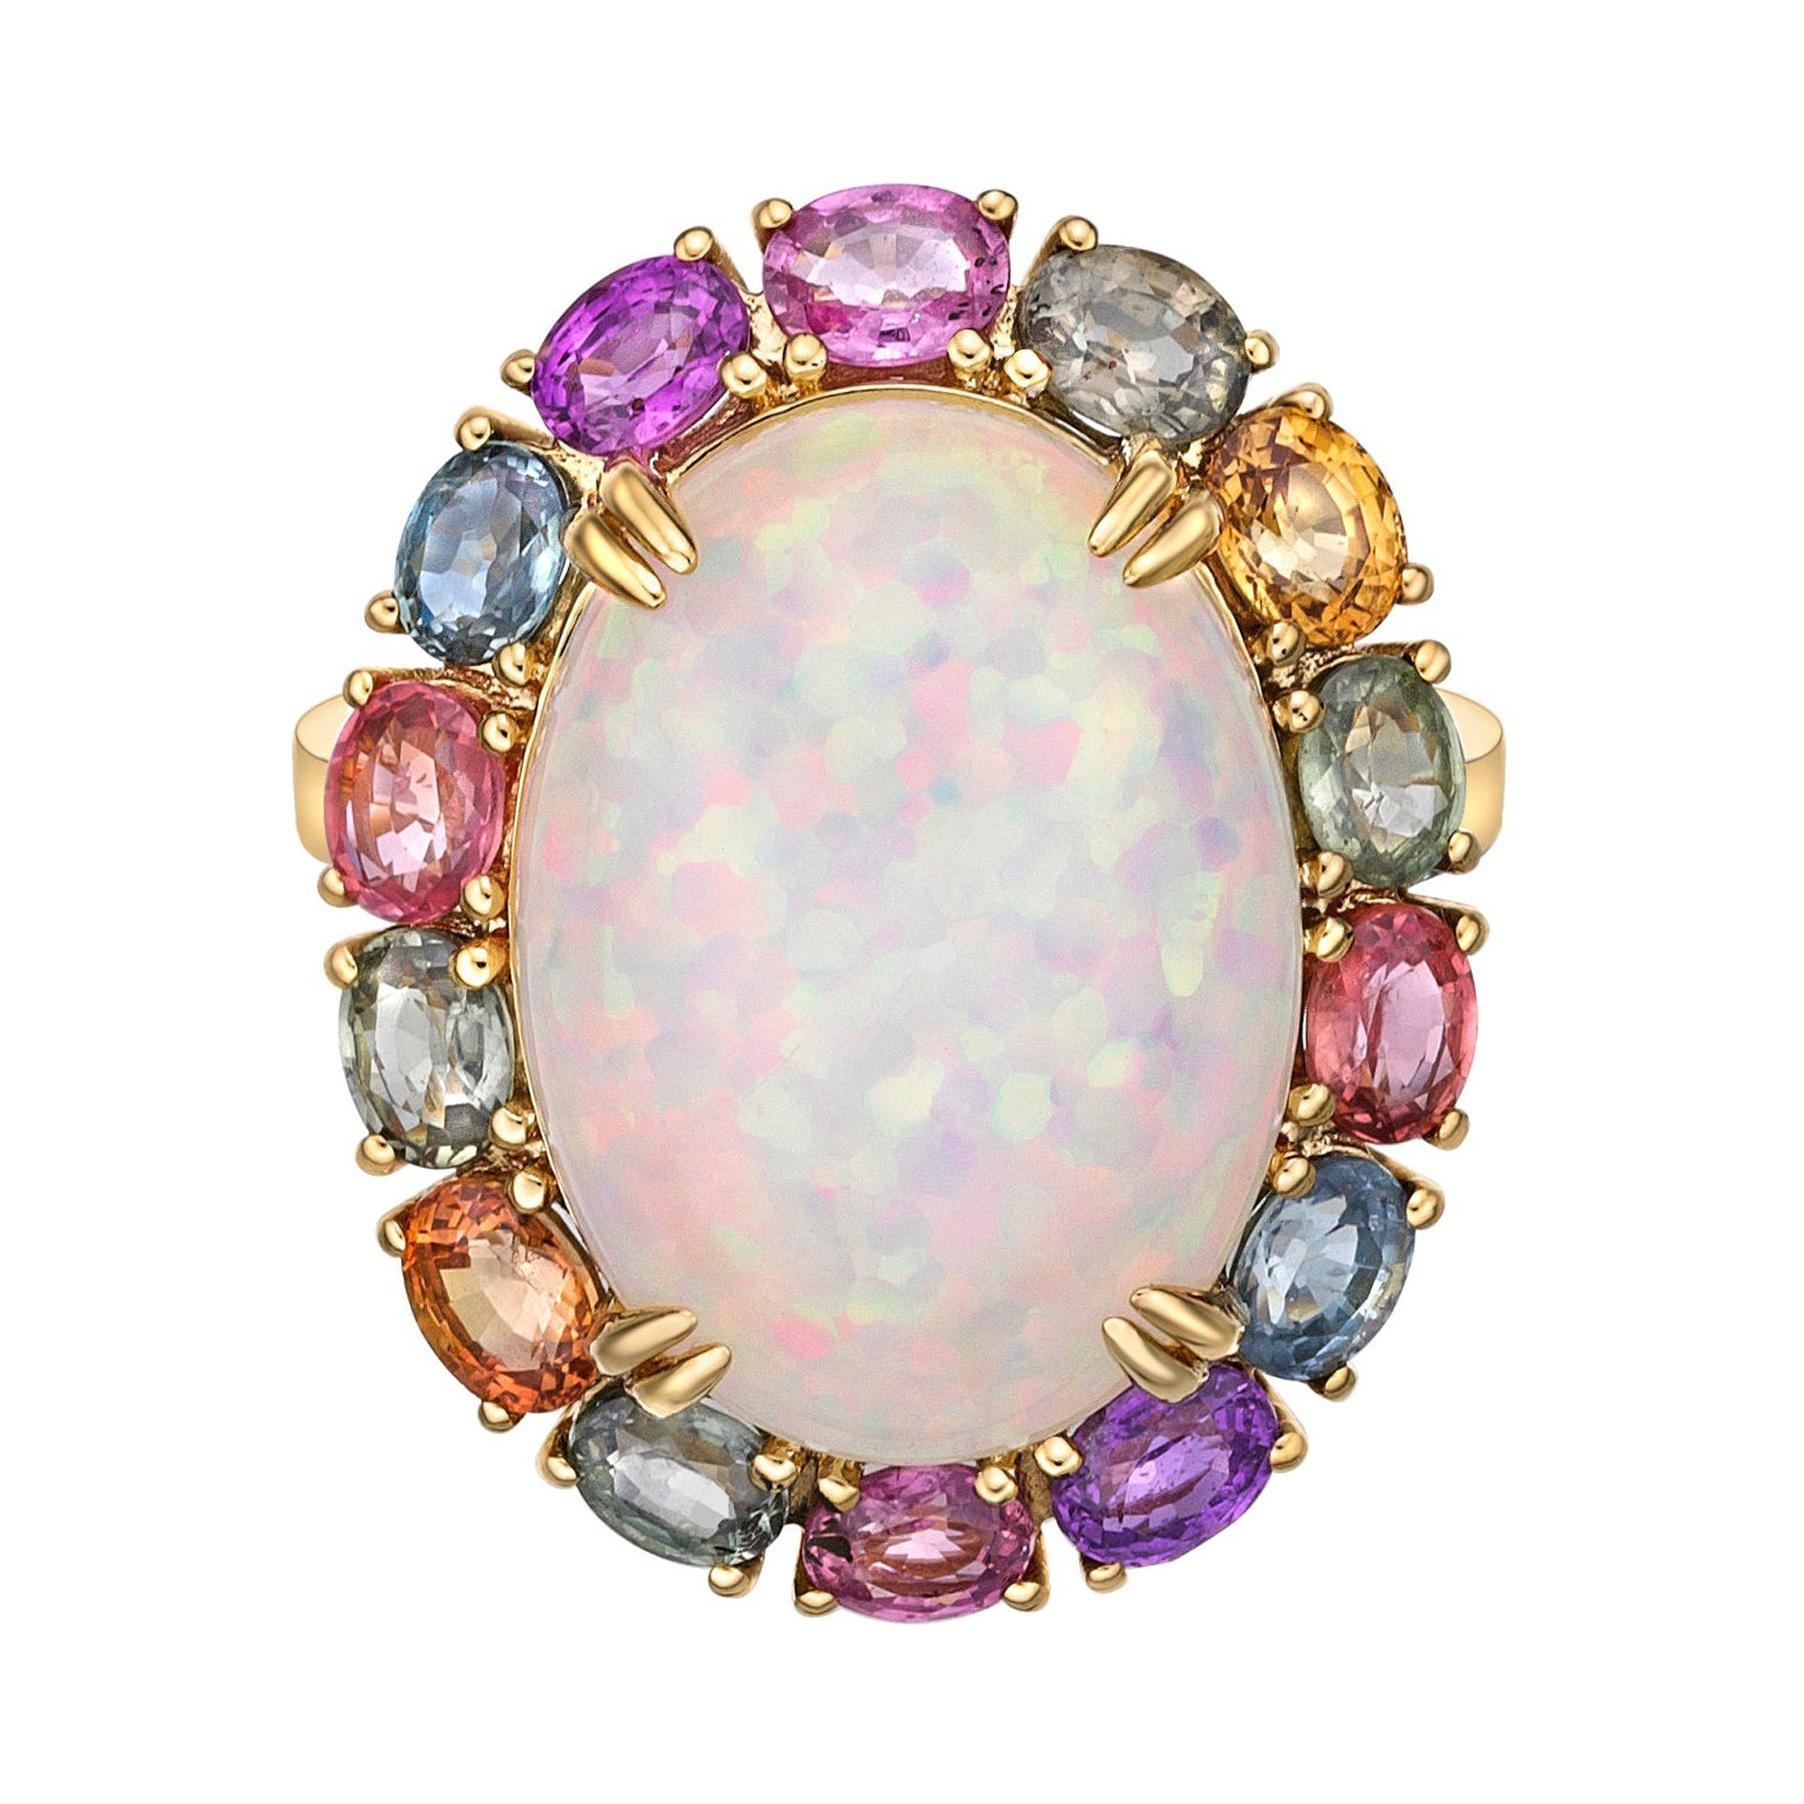 Ethiopian Opal & Rainbow Sapphire Ring with Diamond in 18 Karat Yellow Gold